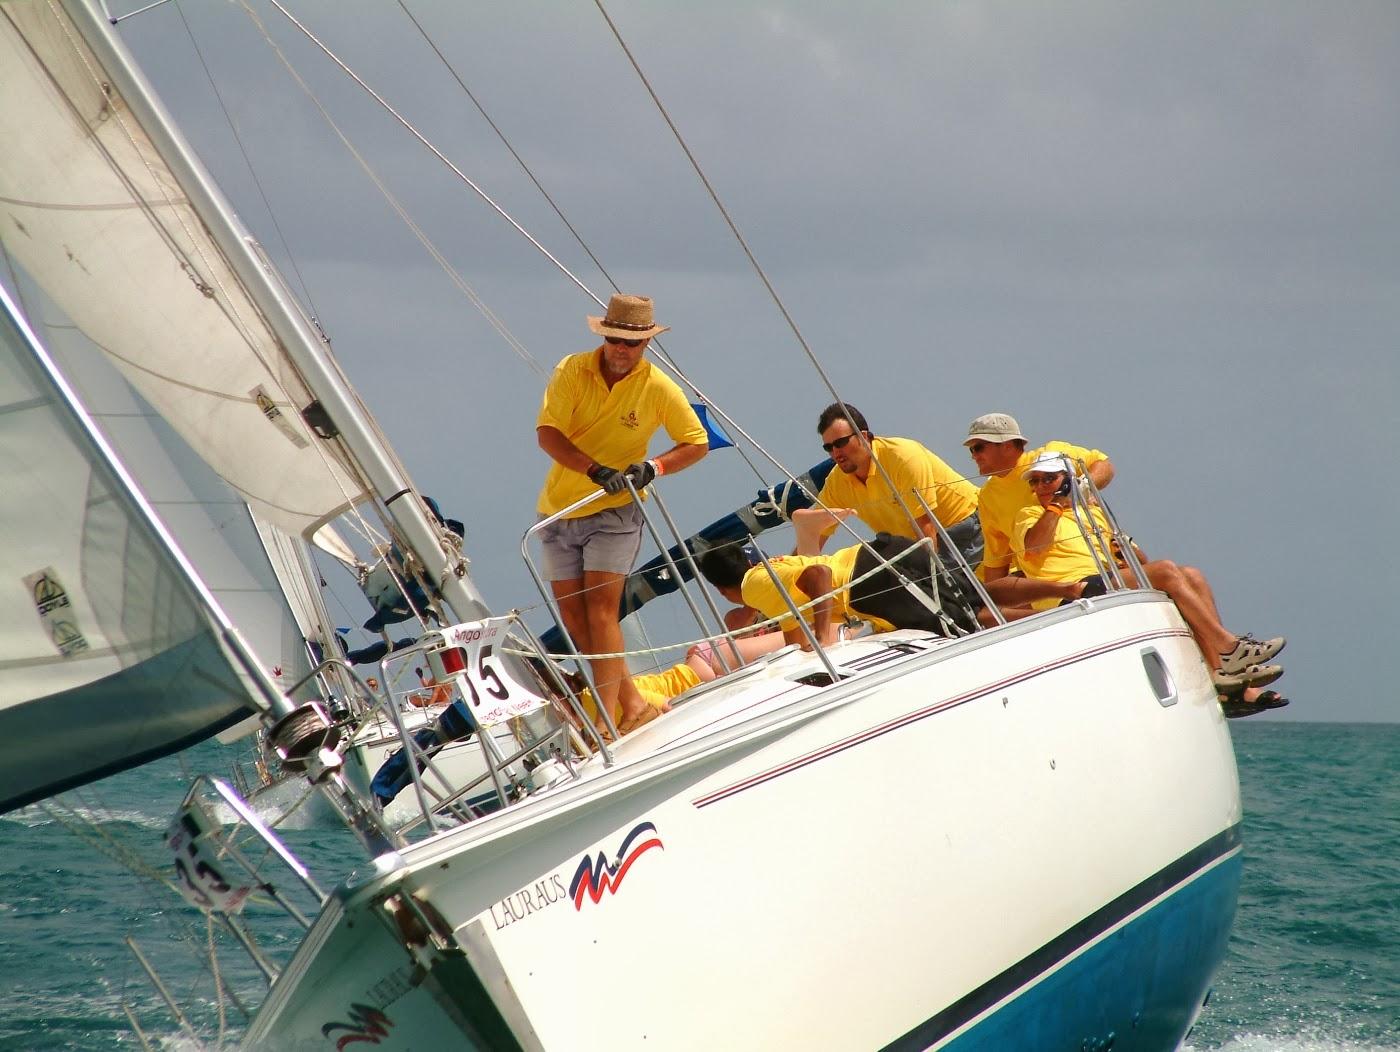 Yacht racing photos - Taking a very sharp turn